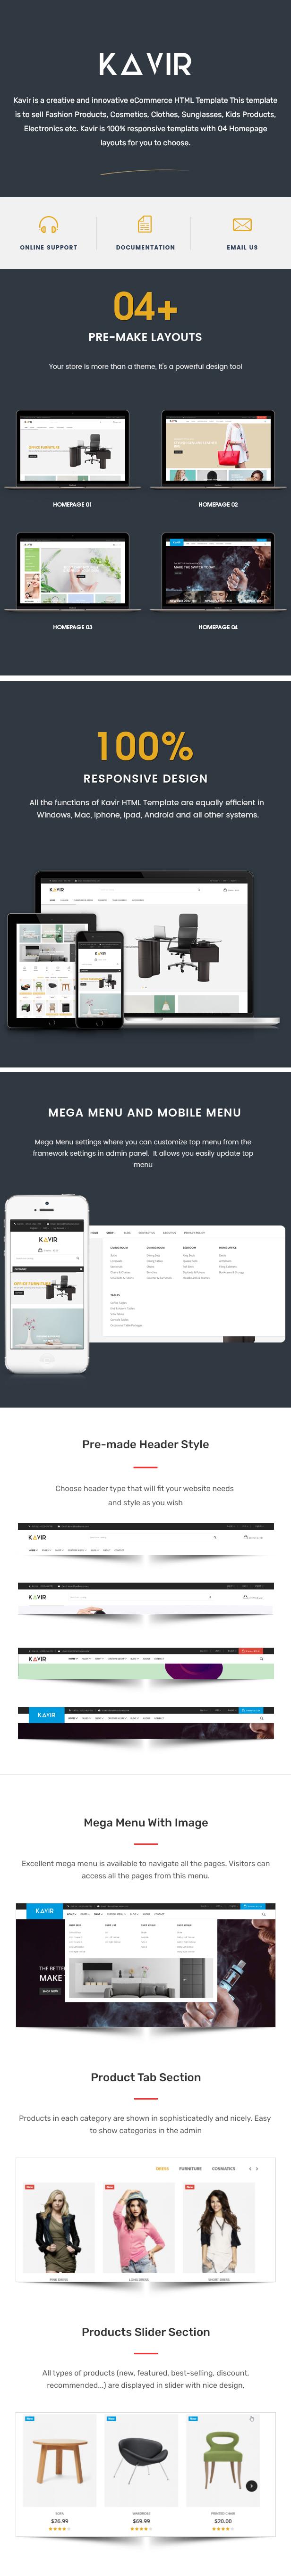 Kavir - eCommerce HTML Template - 1